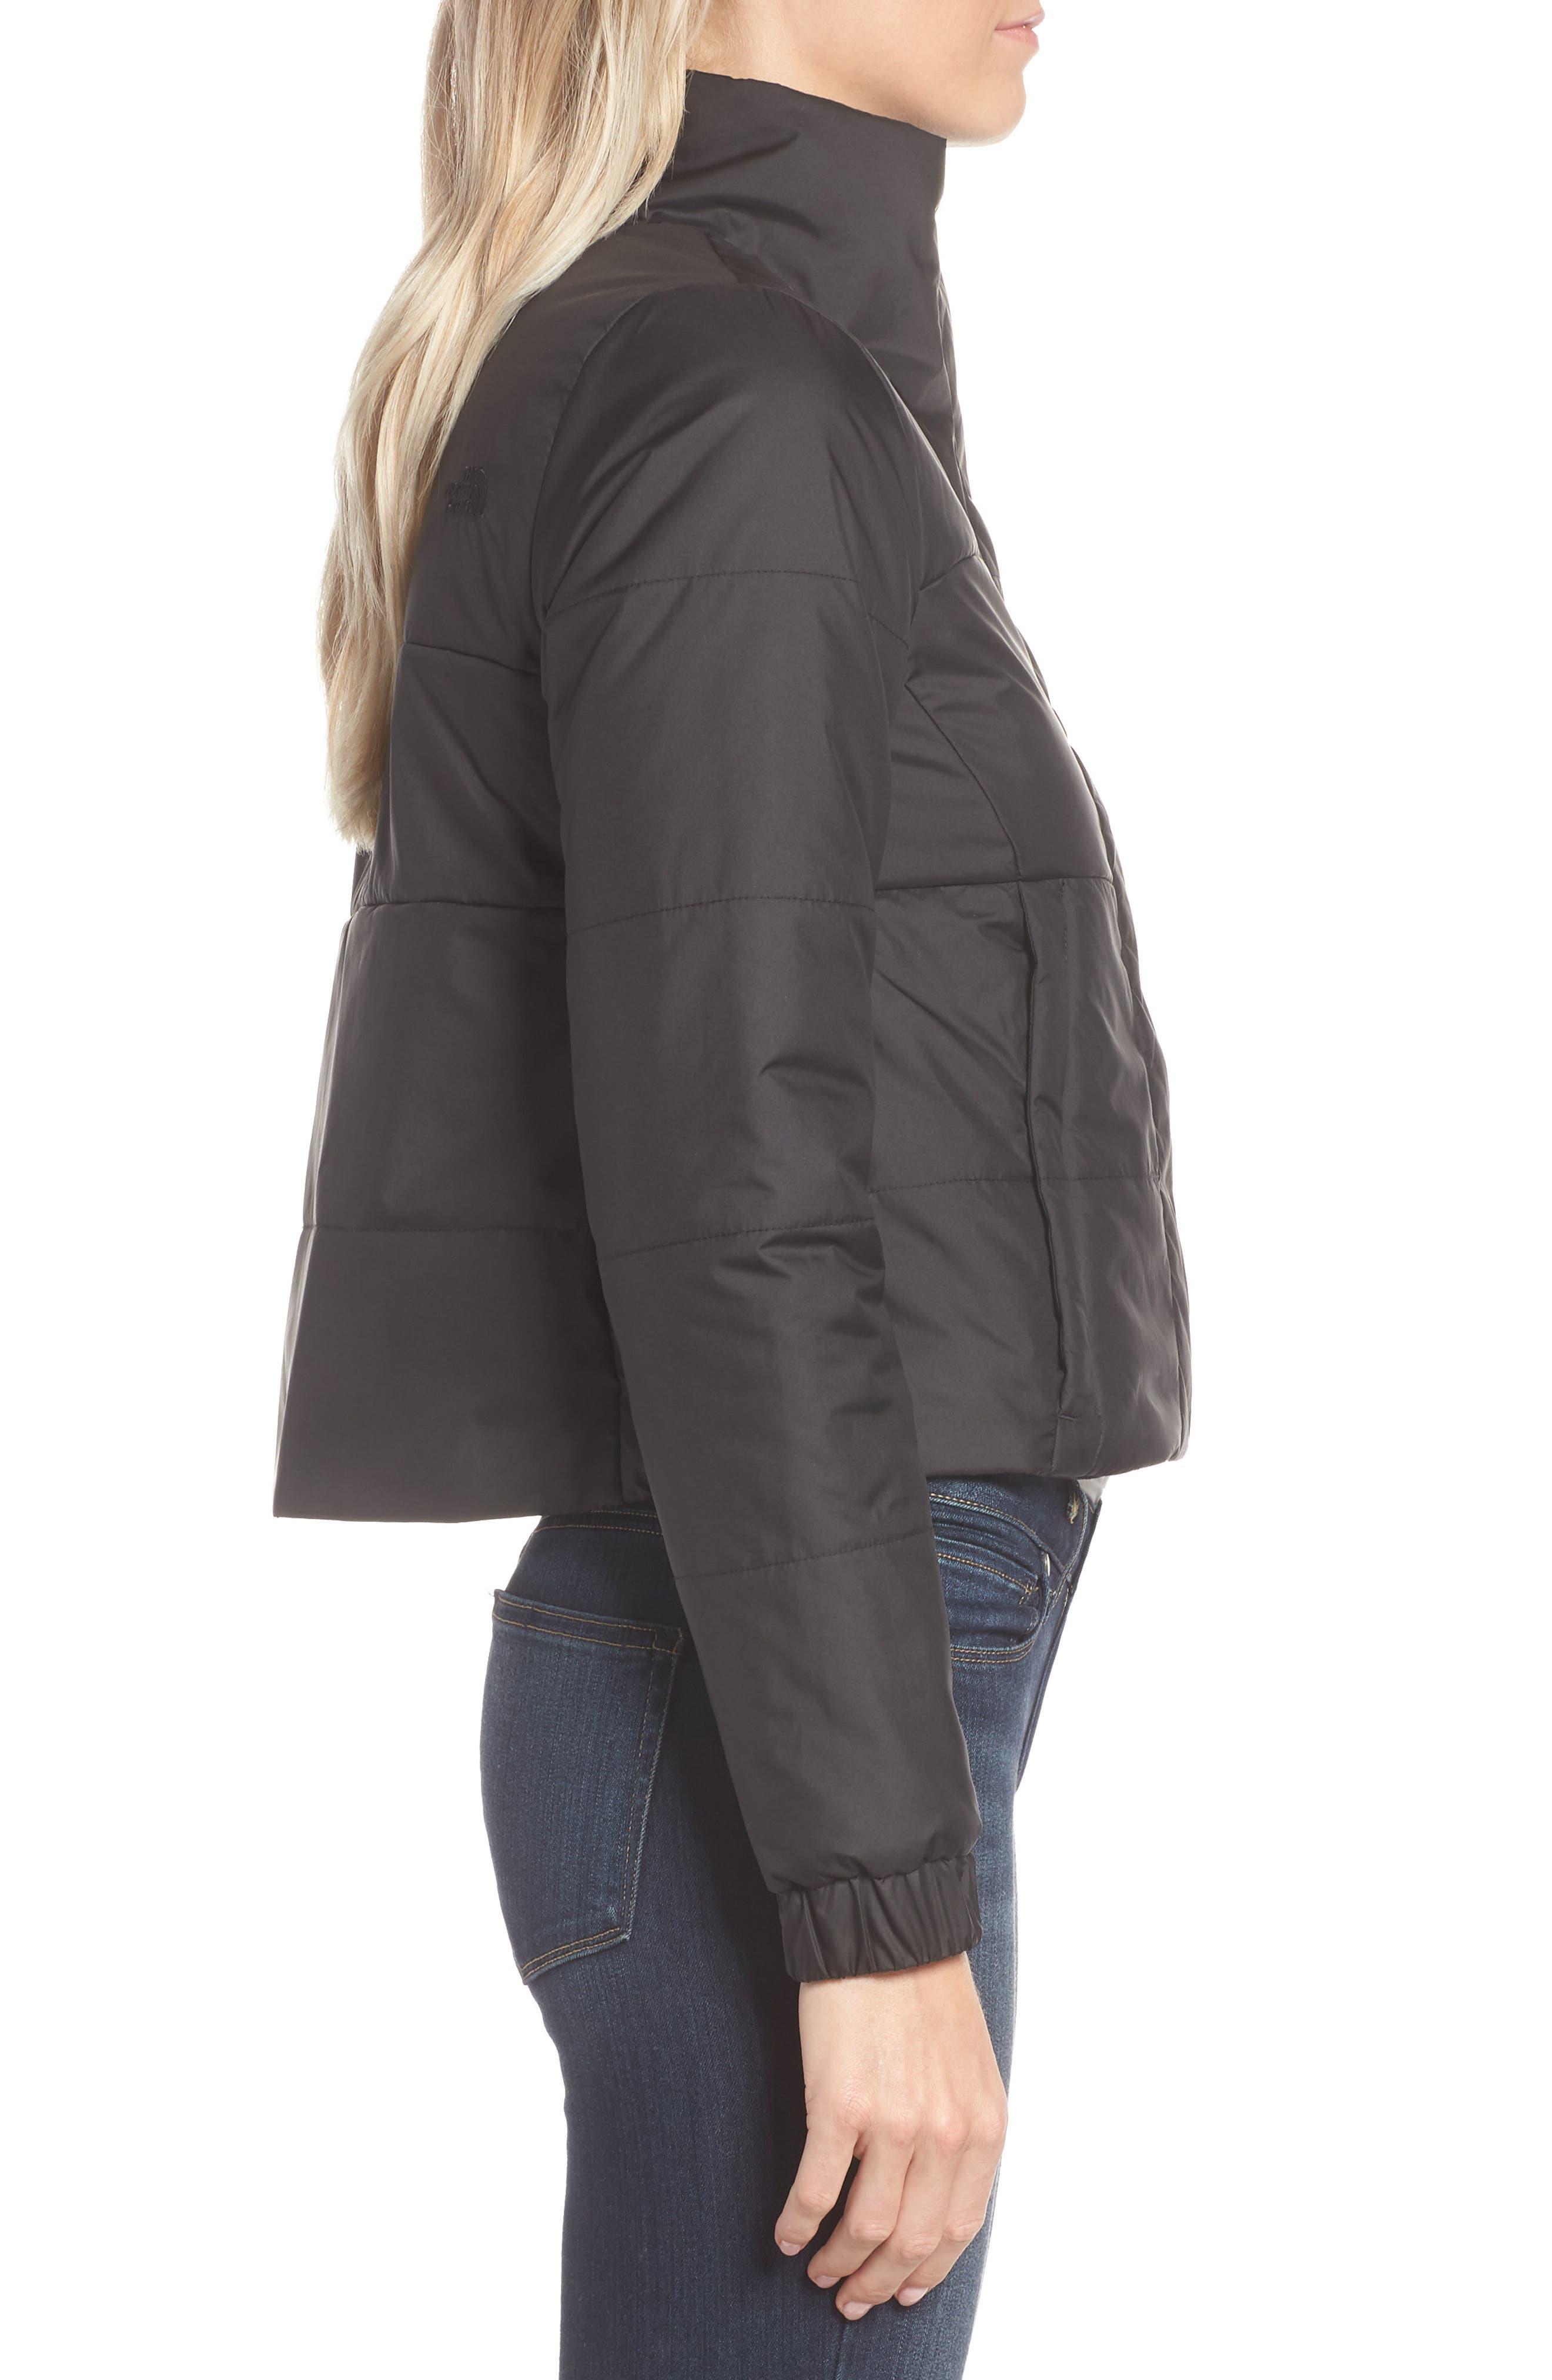 THE NORTH FACE,                             Femtastic Heatseeker Insulated Jacket,                             Alternate thumbnail 3, color,                             TNF BLACK